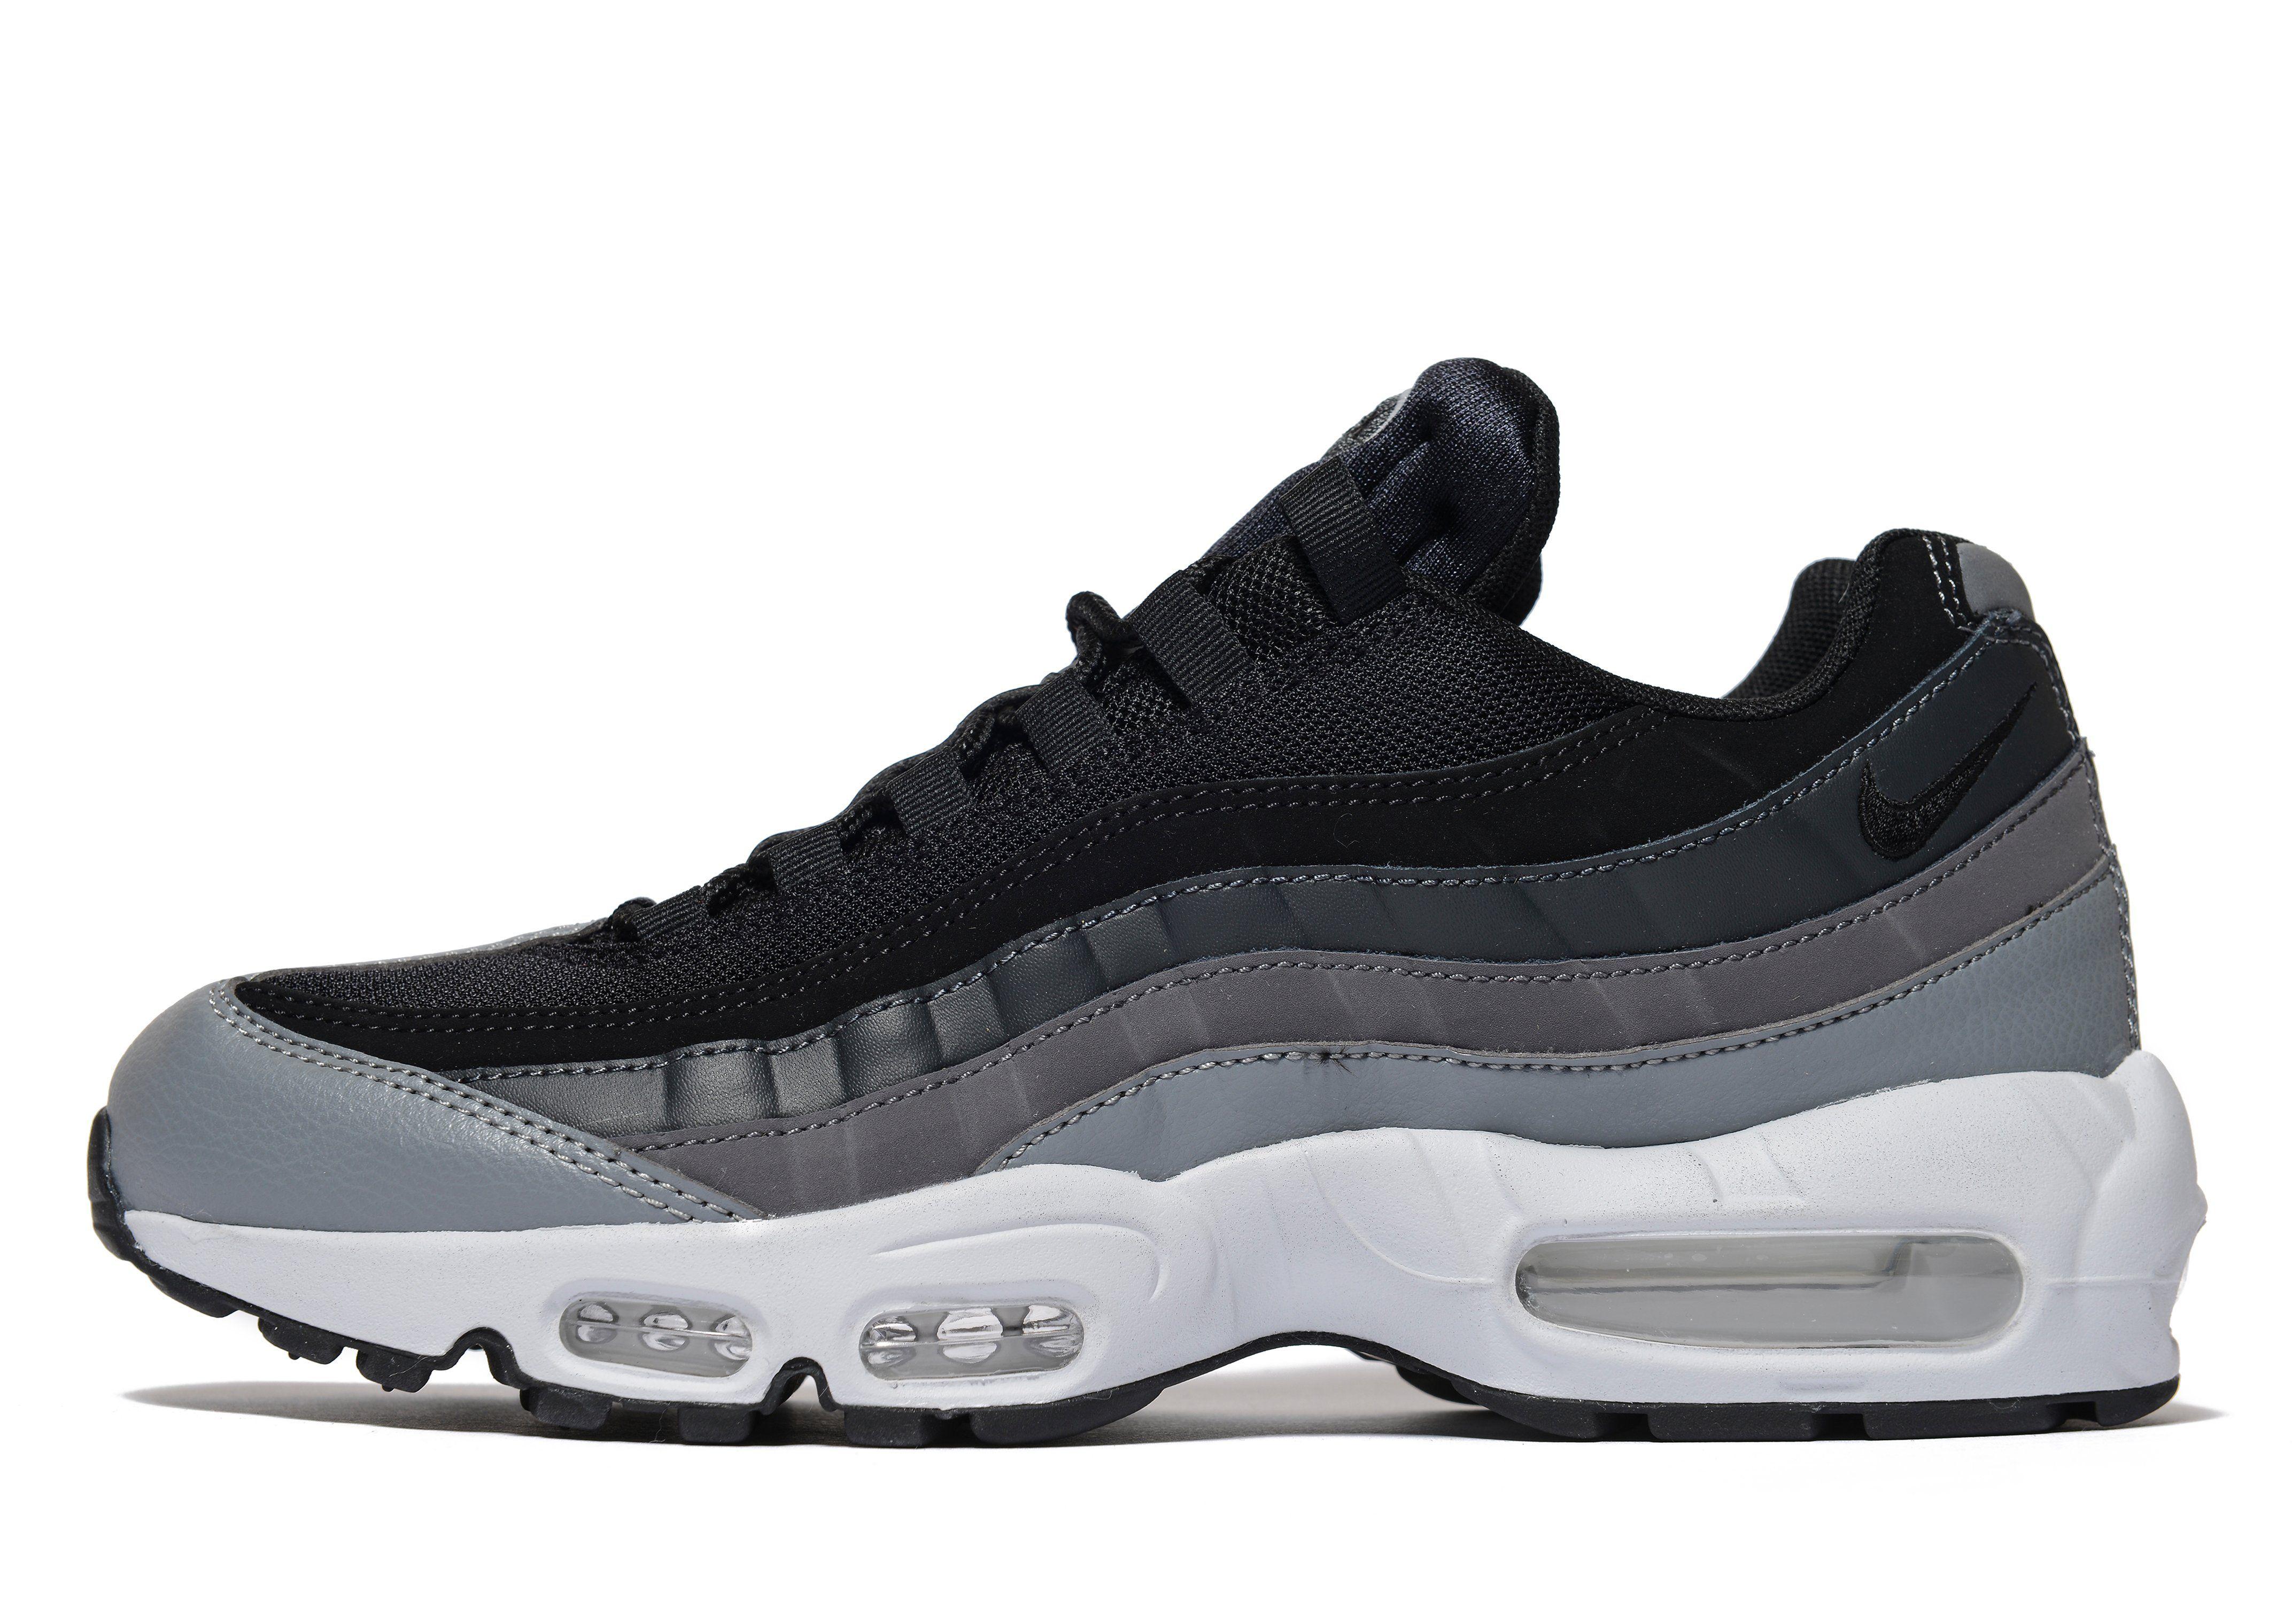 nike air max 95 grey and black